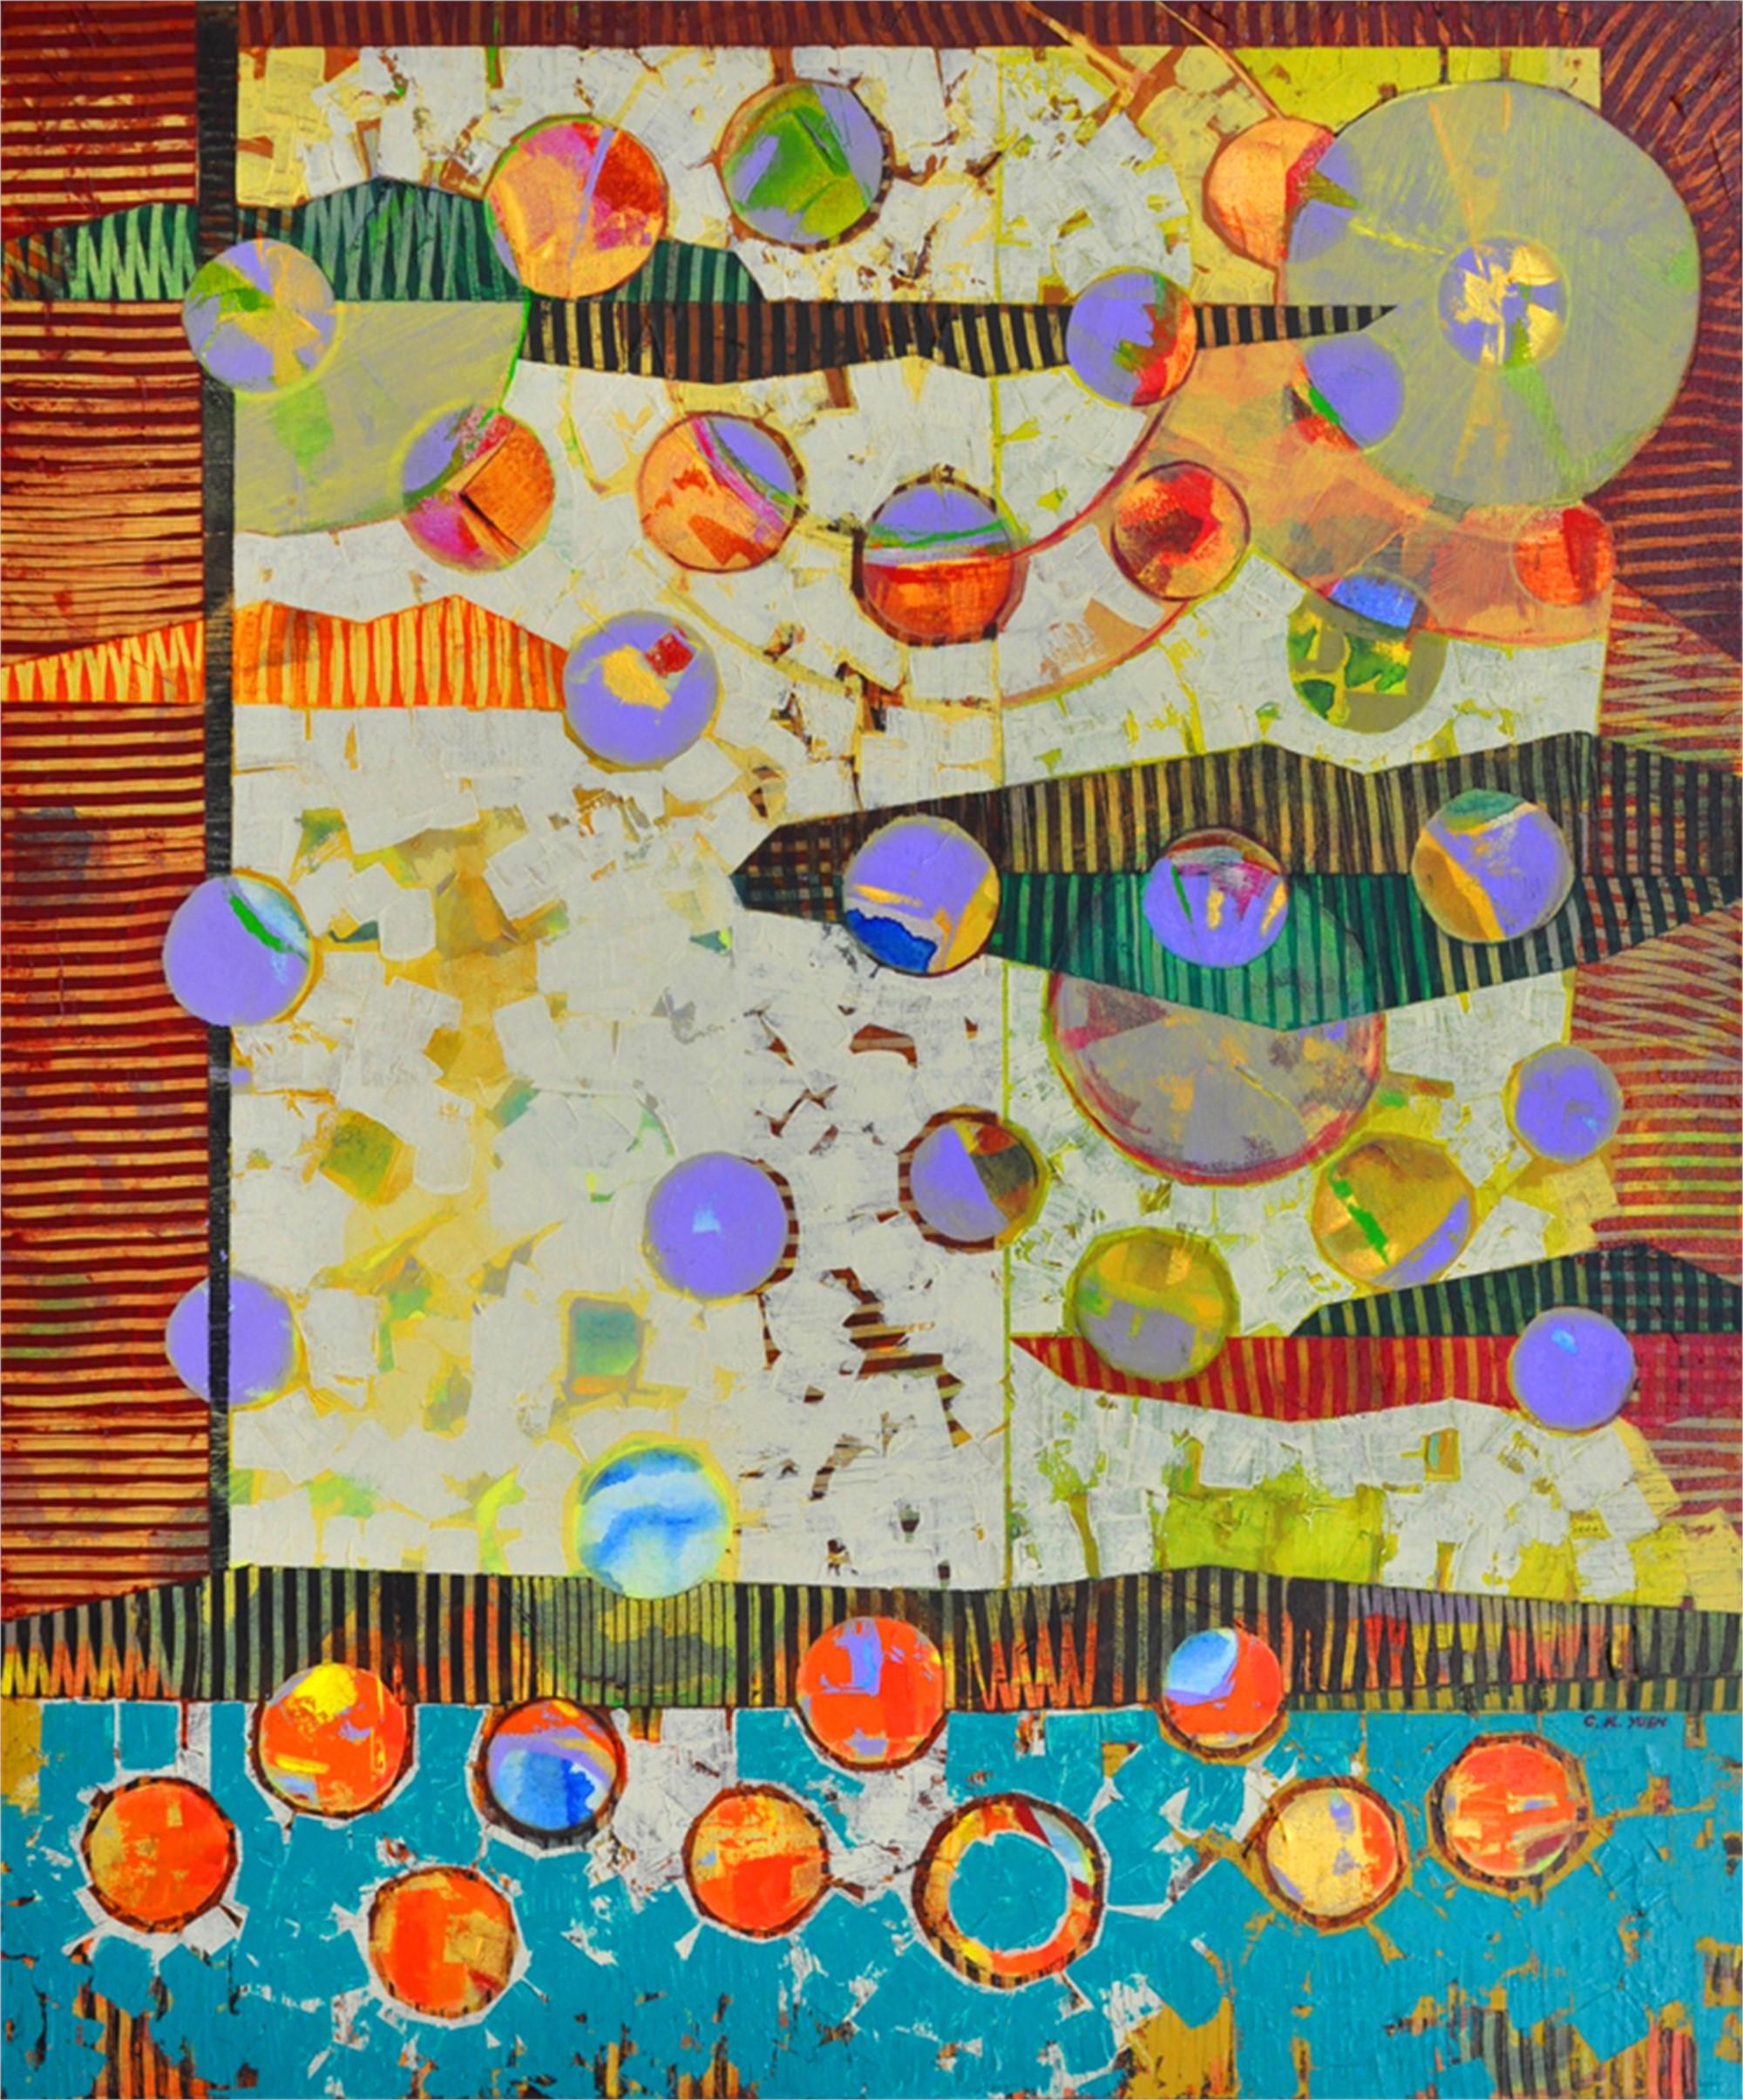 Rising Suns by Chin Yuen